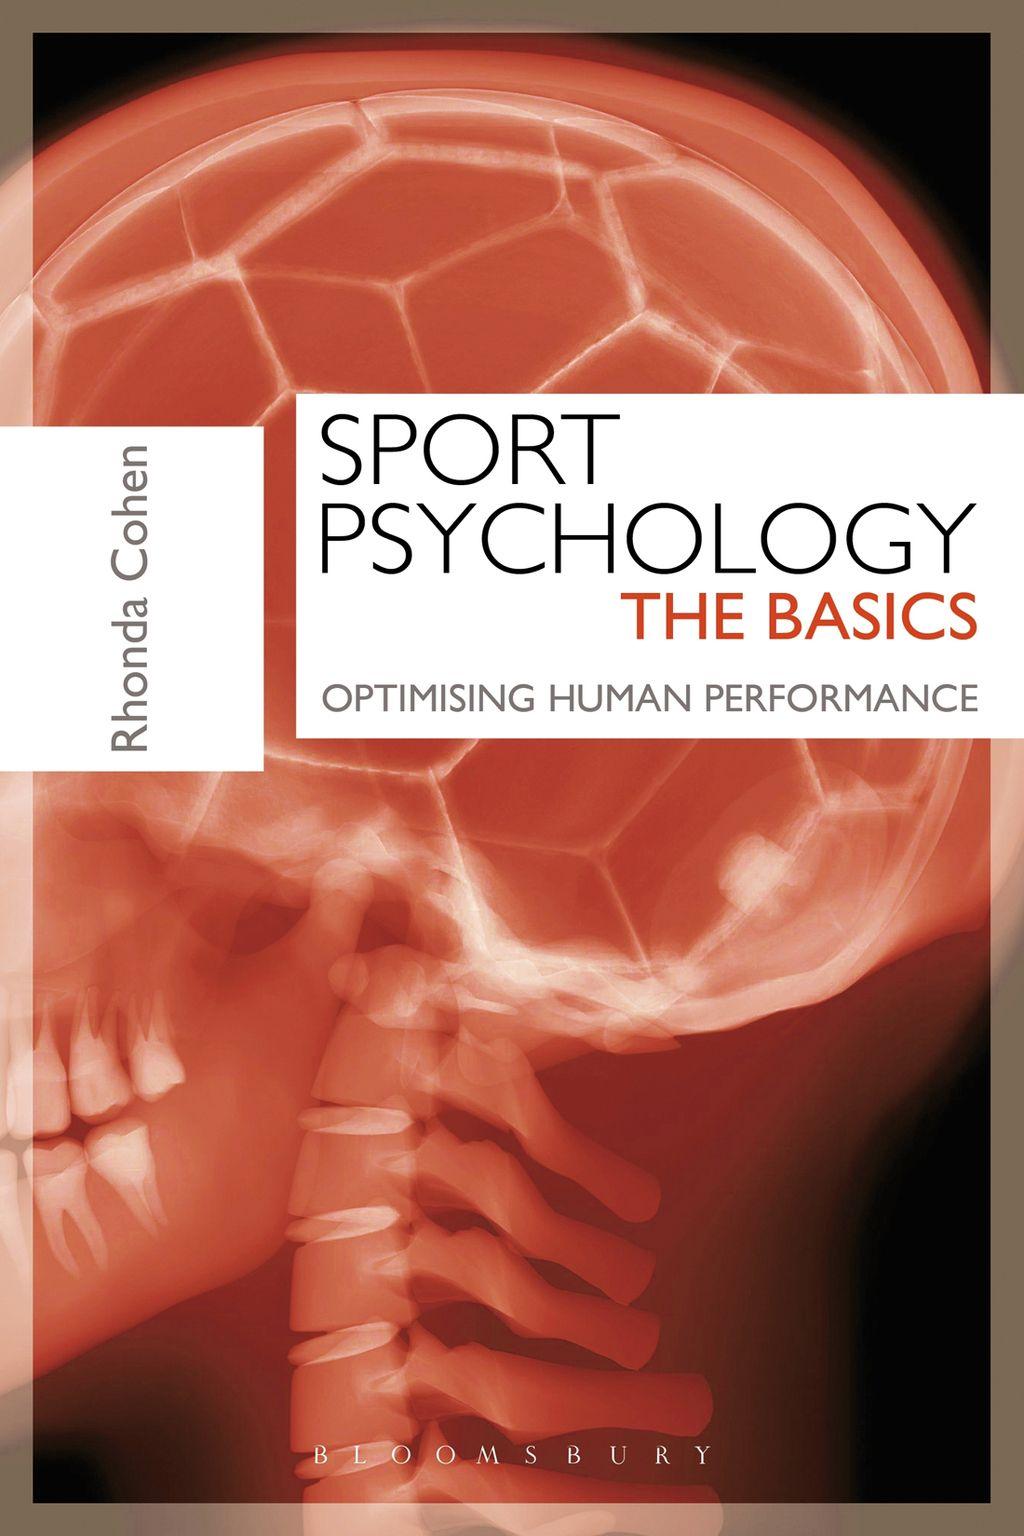 Sport Psychology The Basics (eBook) Psychology, Sports